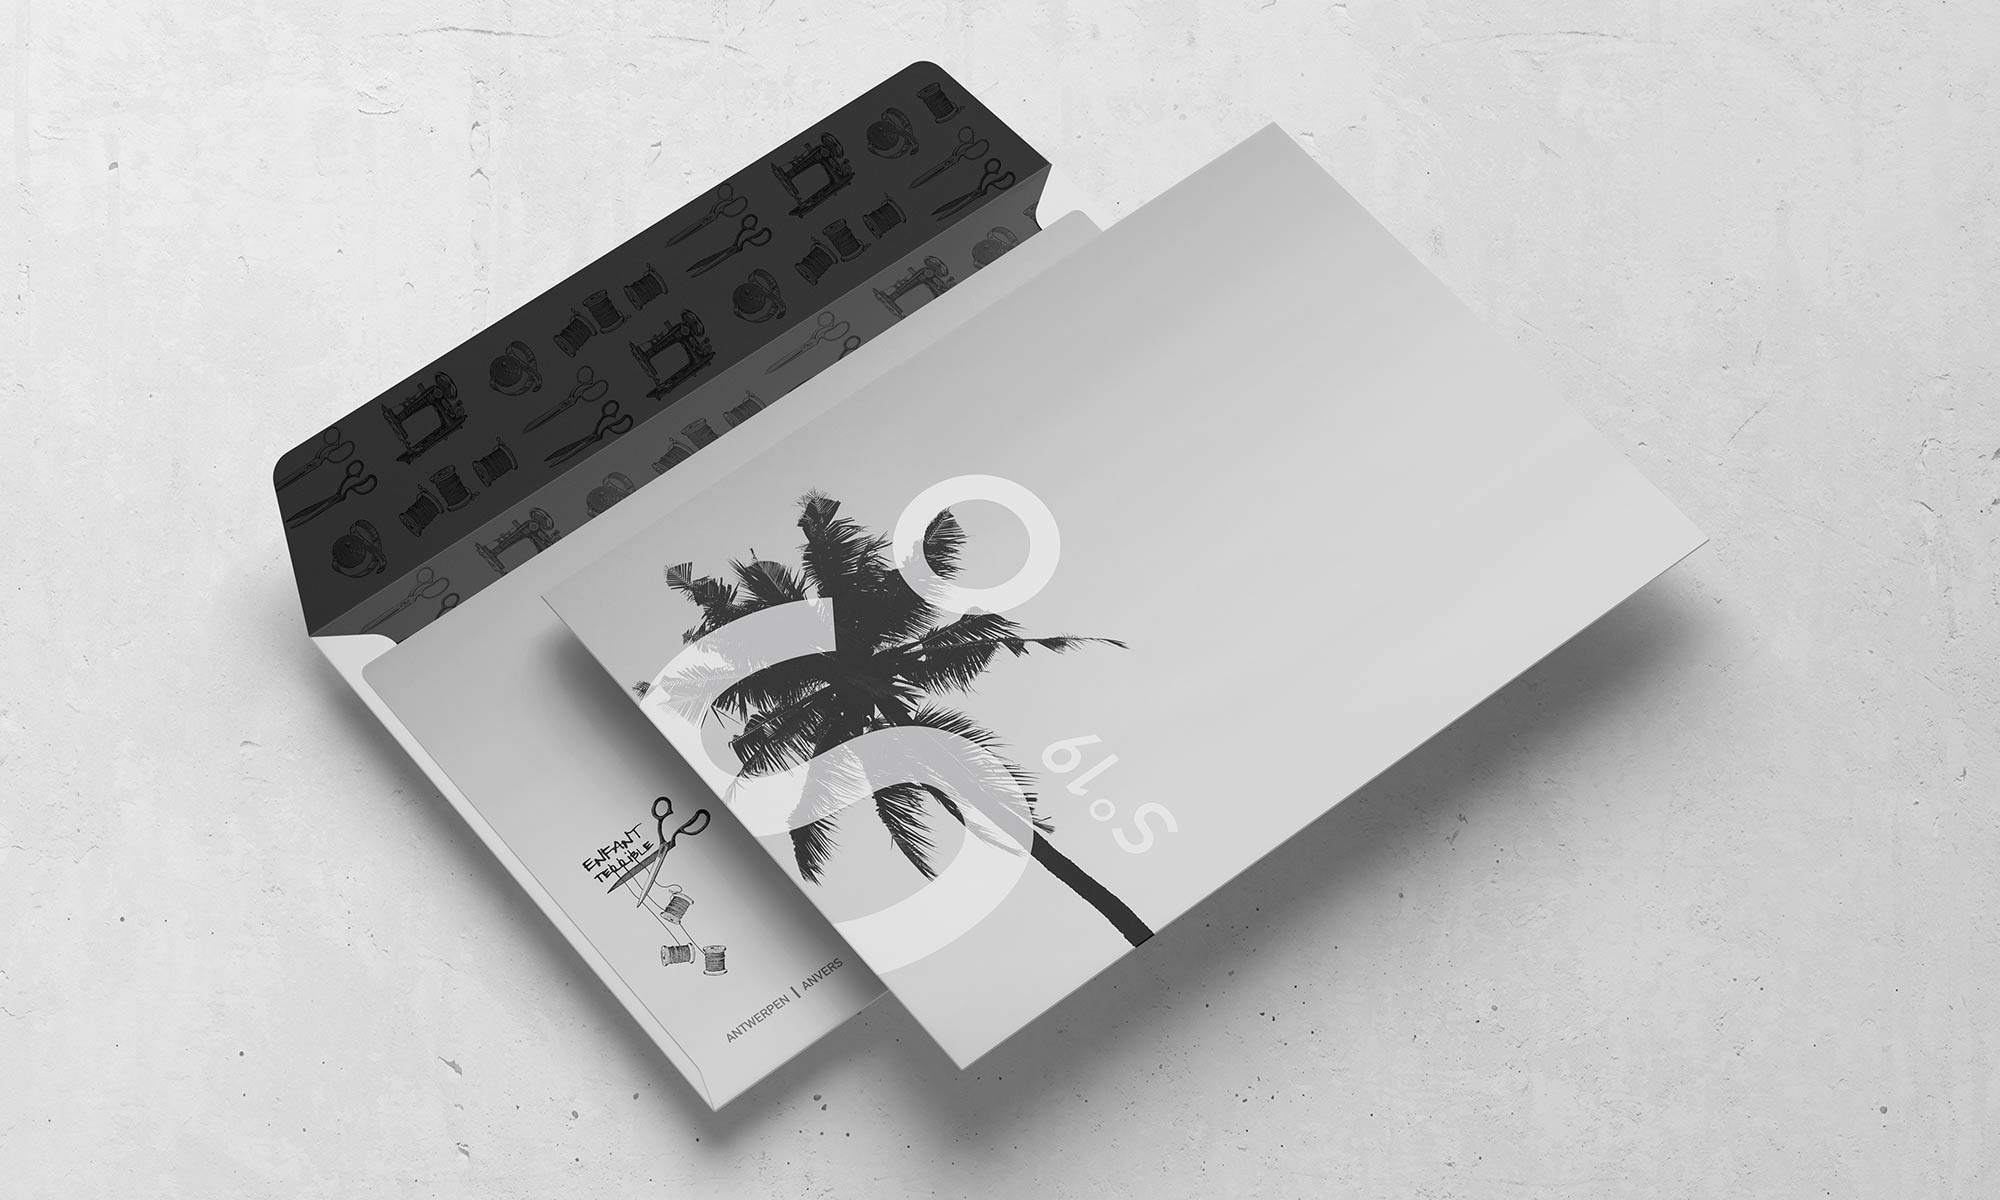 enfant-terrible-S19-Mode Umschlag Einladung